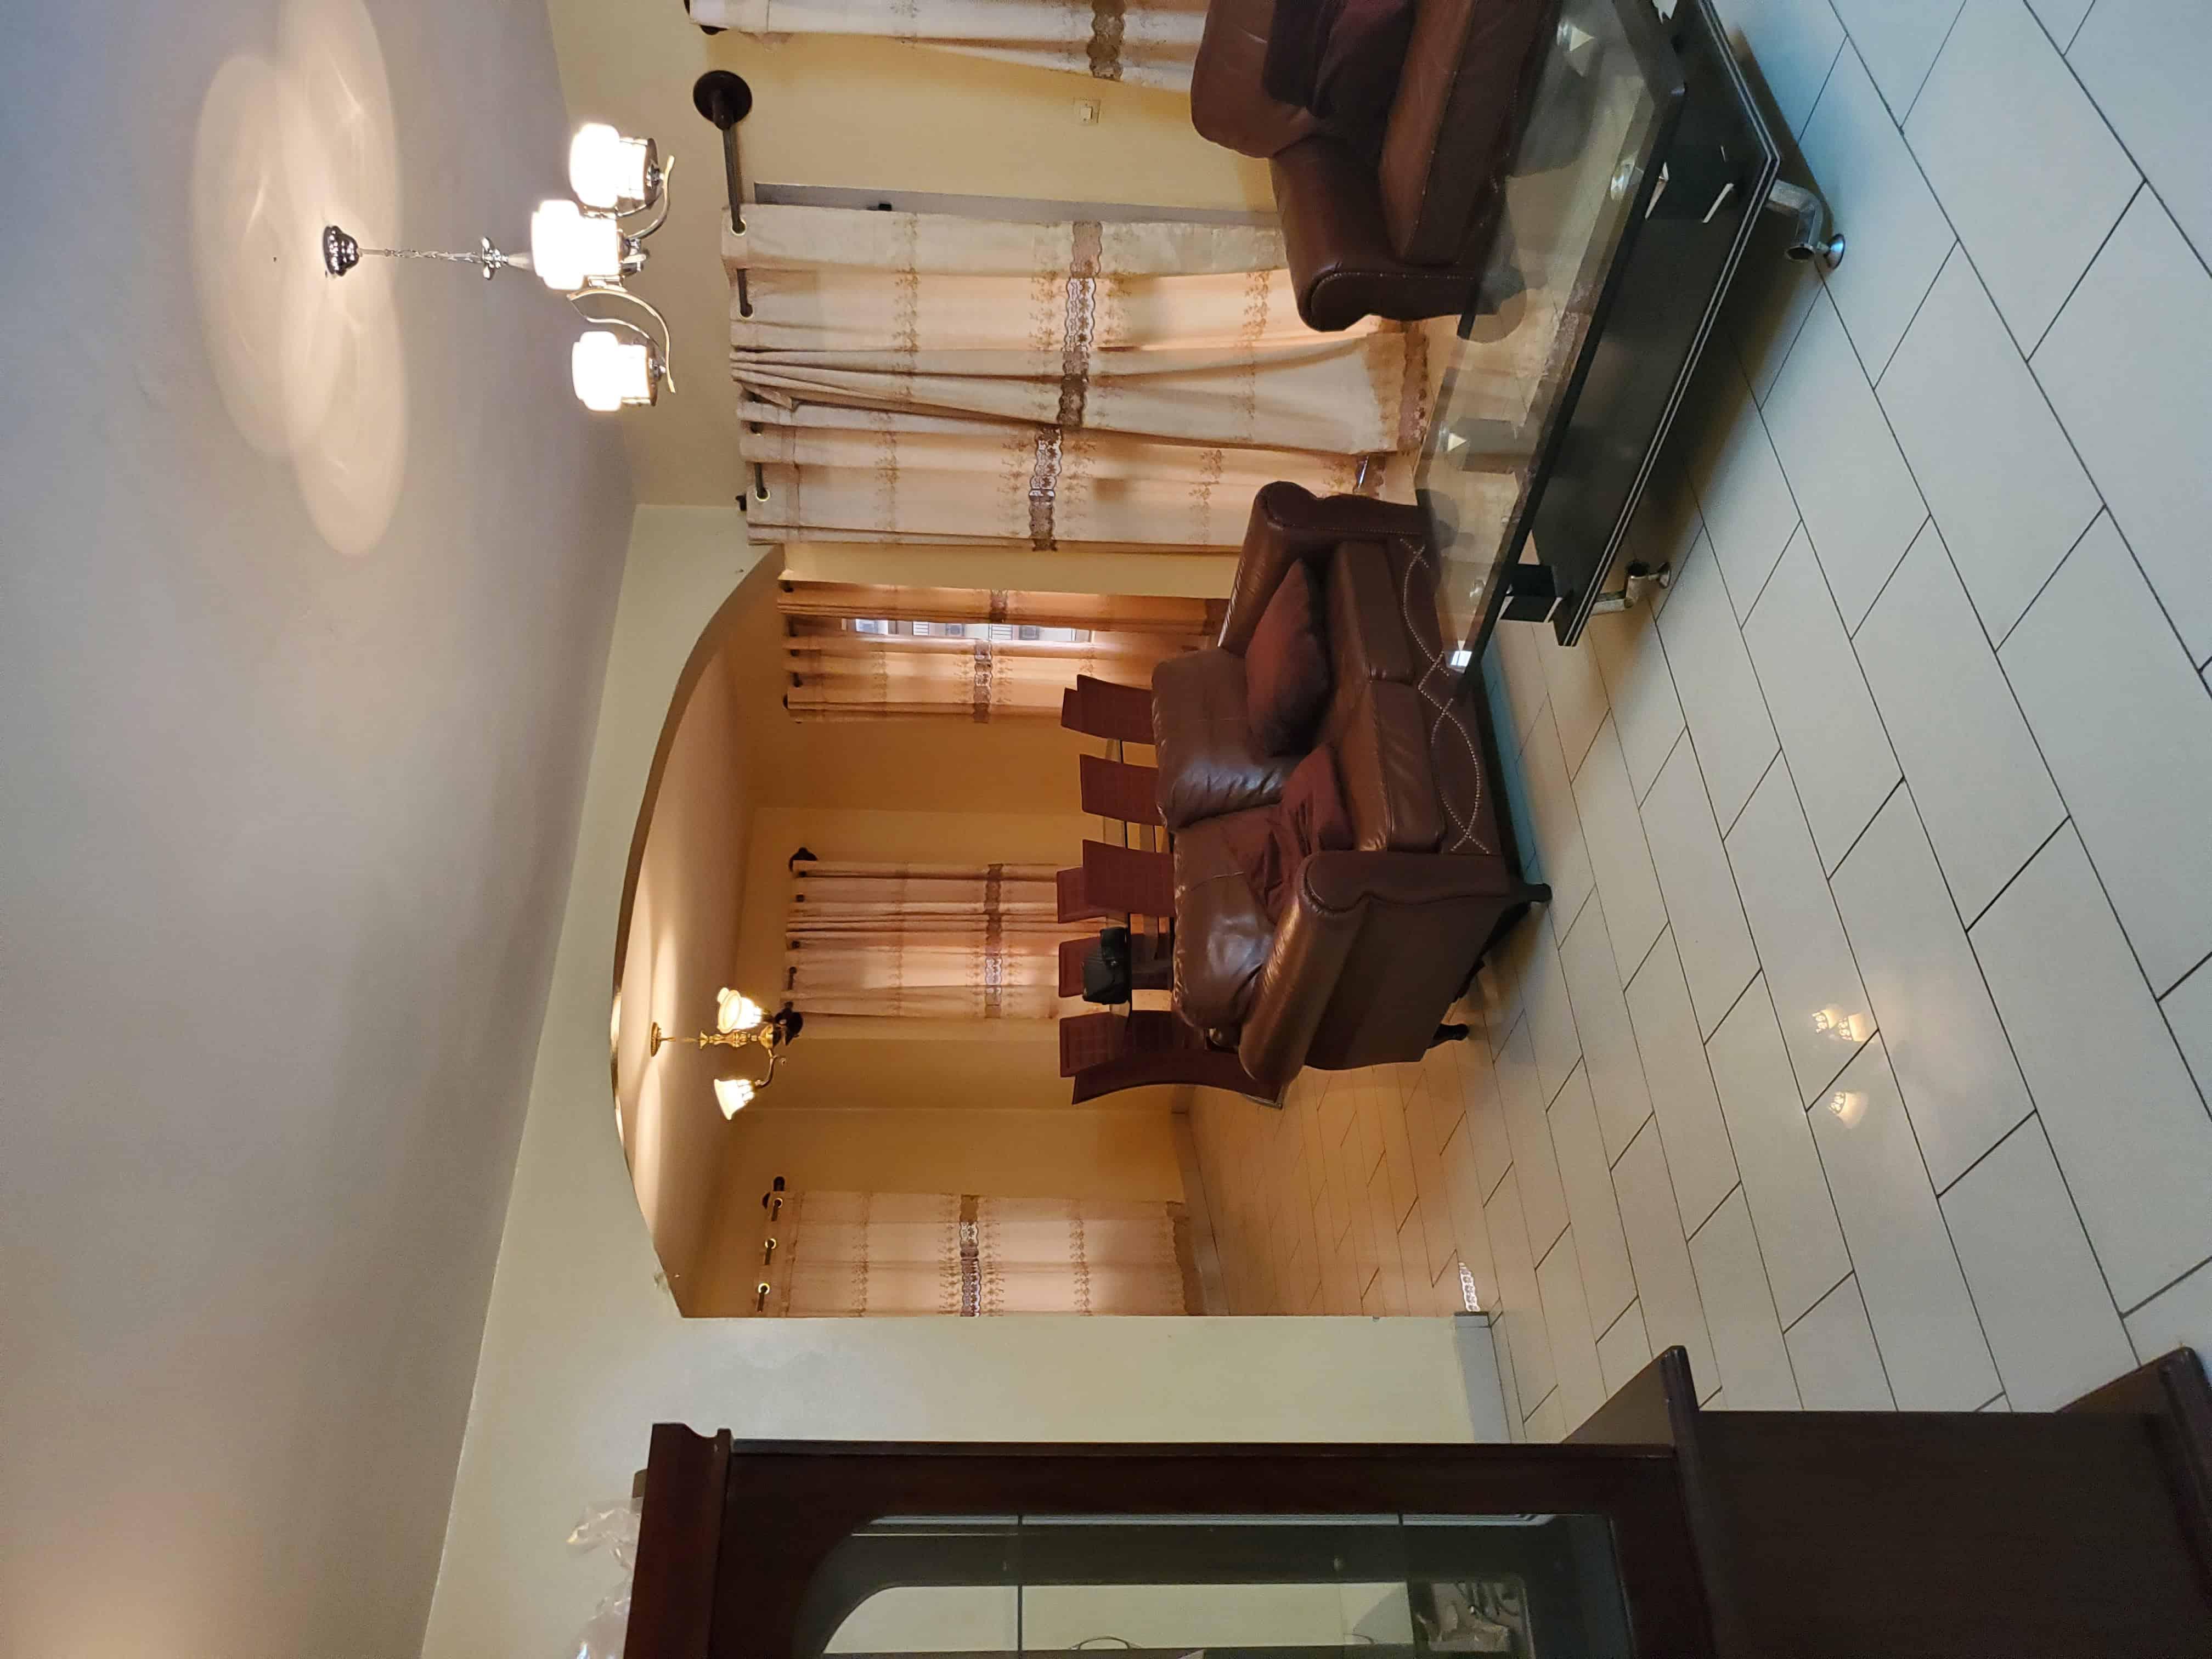 Apartment to rent - Yaoundé, Odza, Tradex/poste de police - 1 living room(s), 3 bedroom(s), 2 bathroom(s) - 20 000 FCFA / month